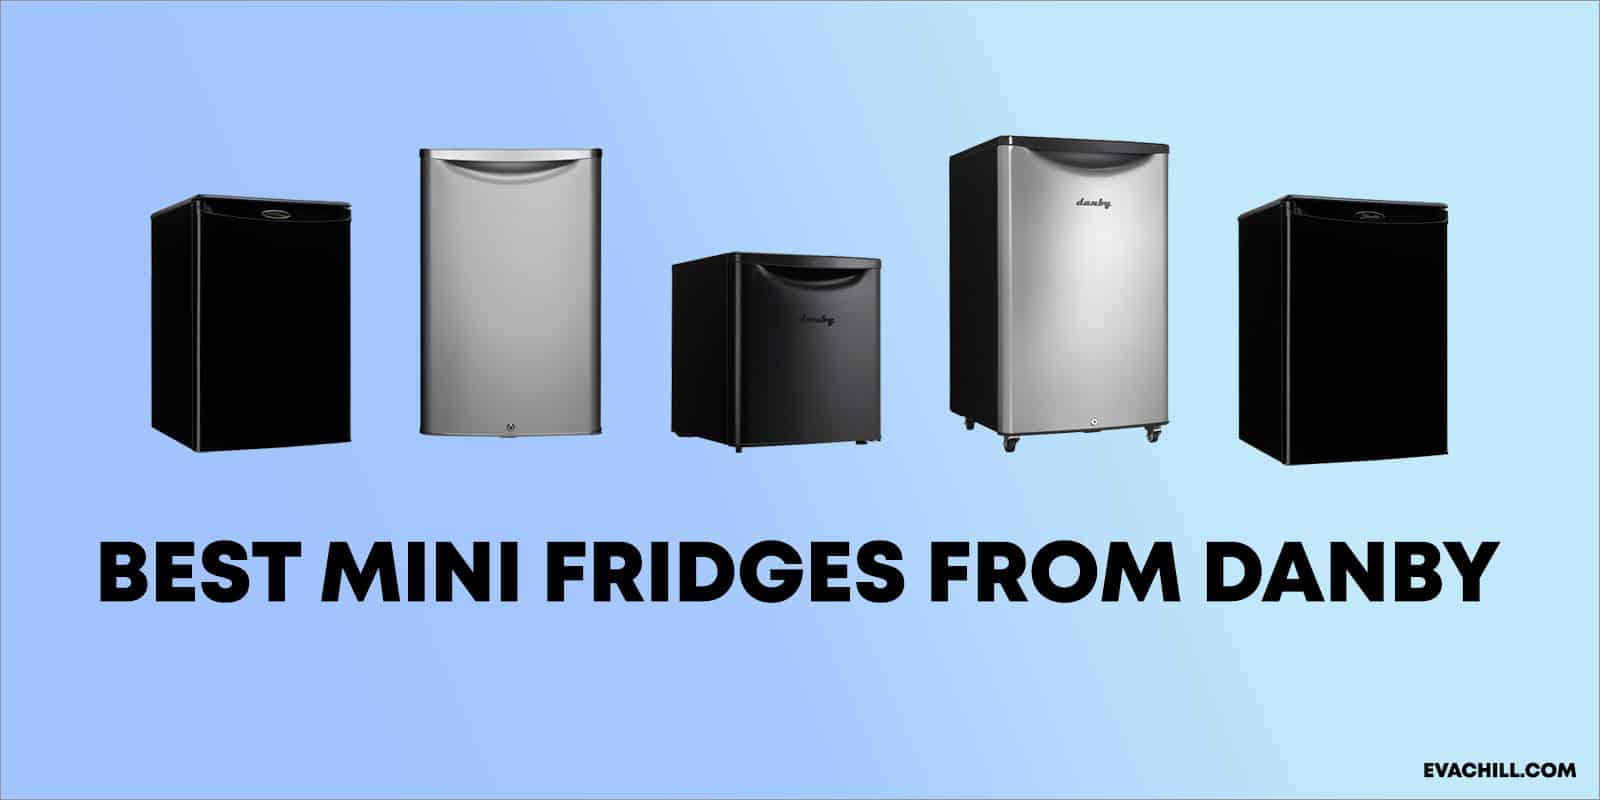 Danby Mini Refrigerators